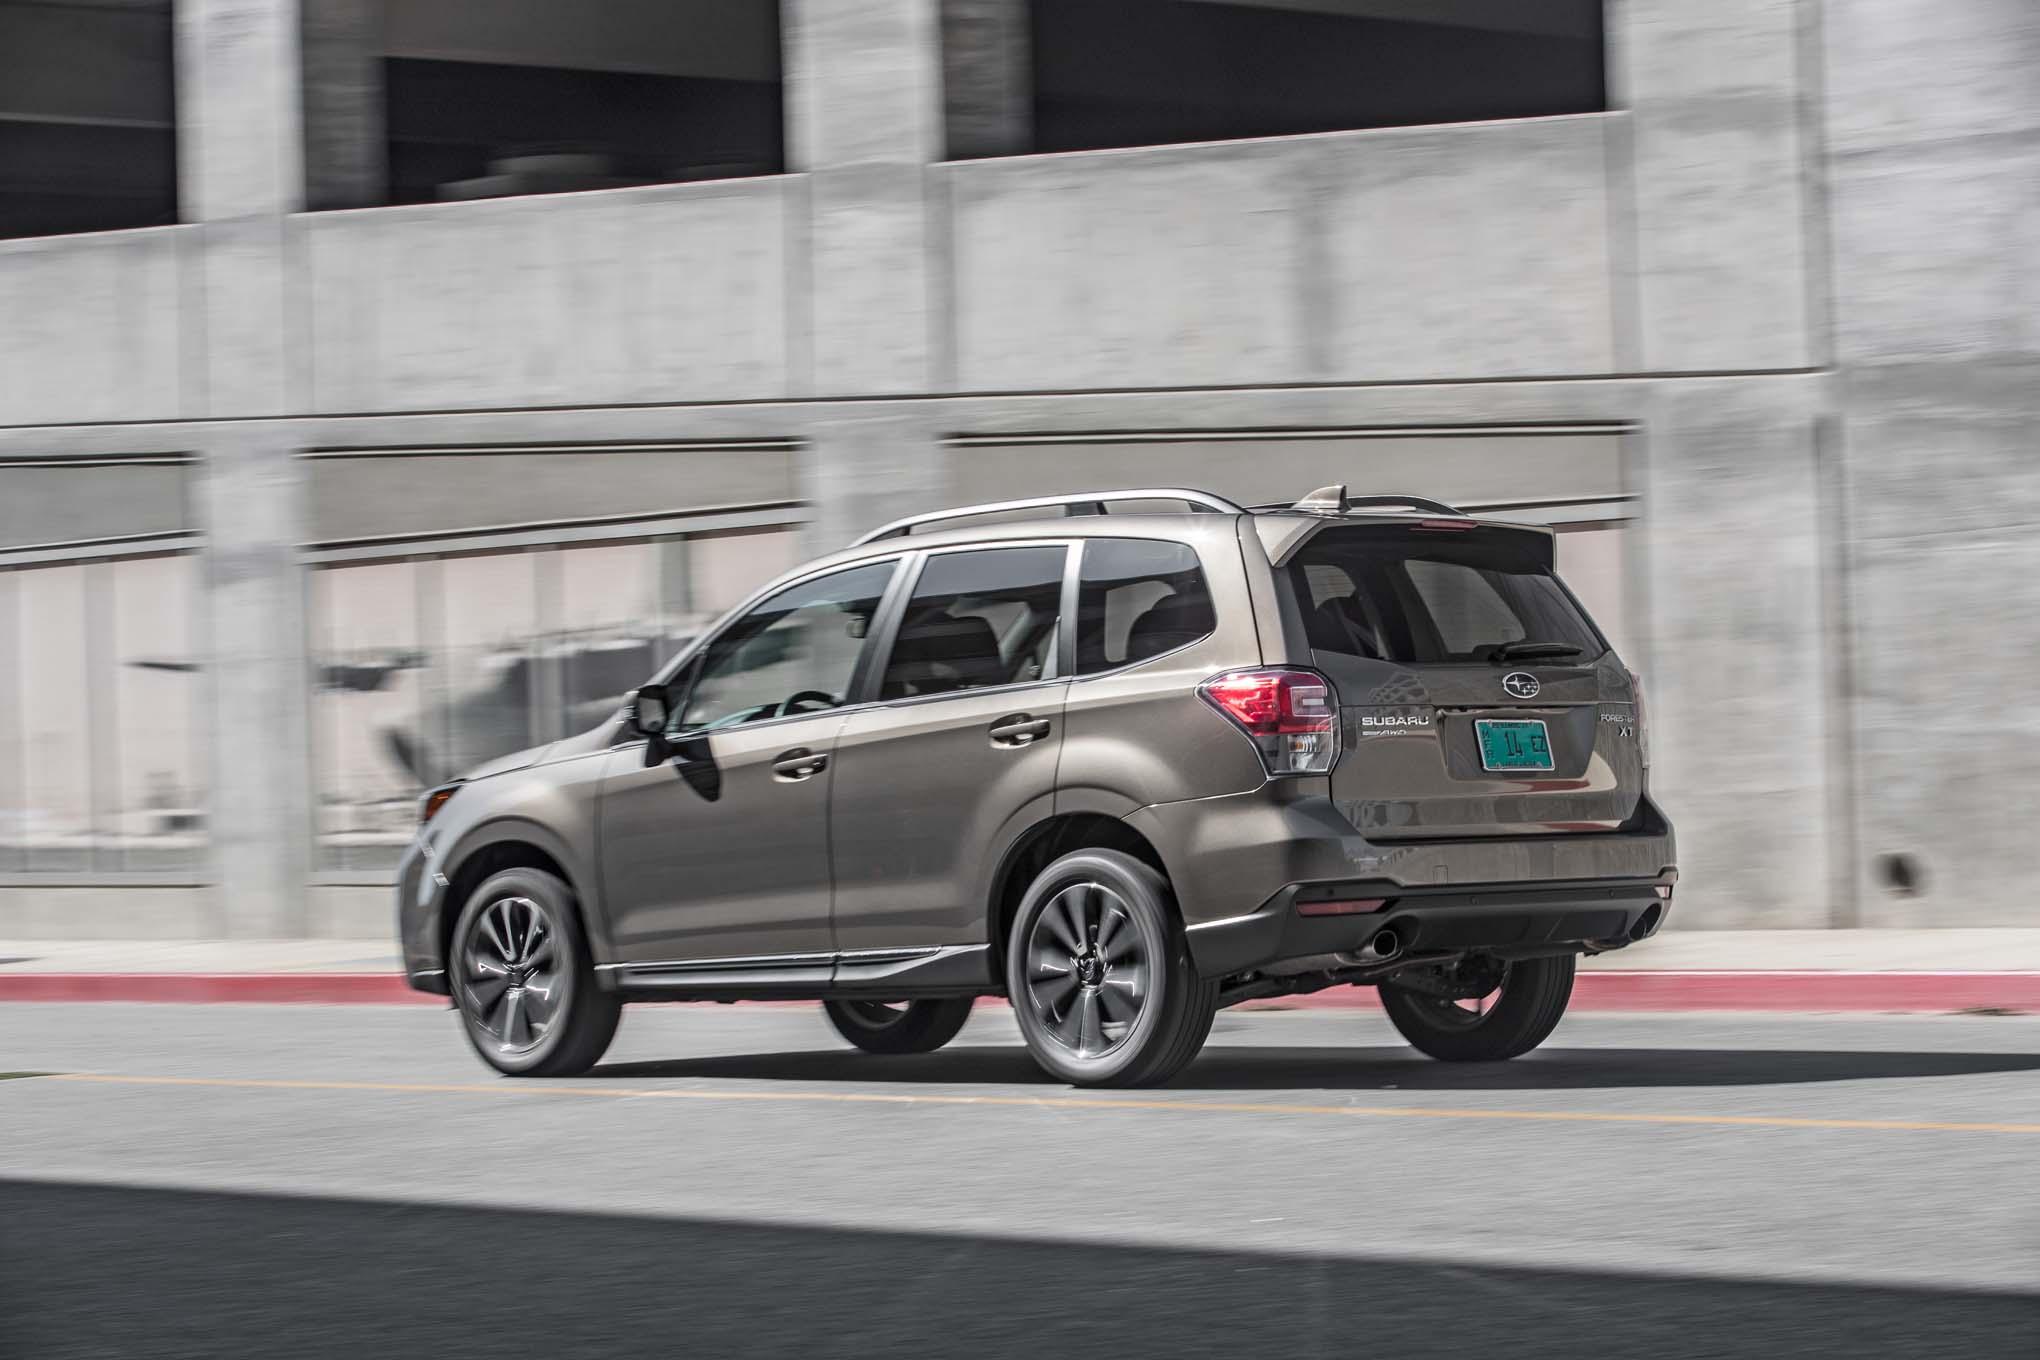 Subaru Outback Vs Forester >> Subaru to Debut 50th Anniversary Limited Edition Models | Automobile Magazine